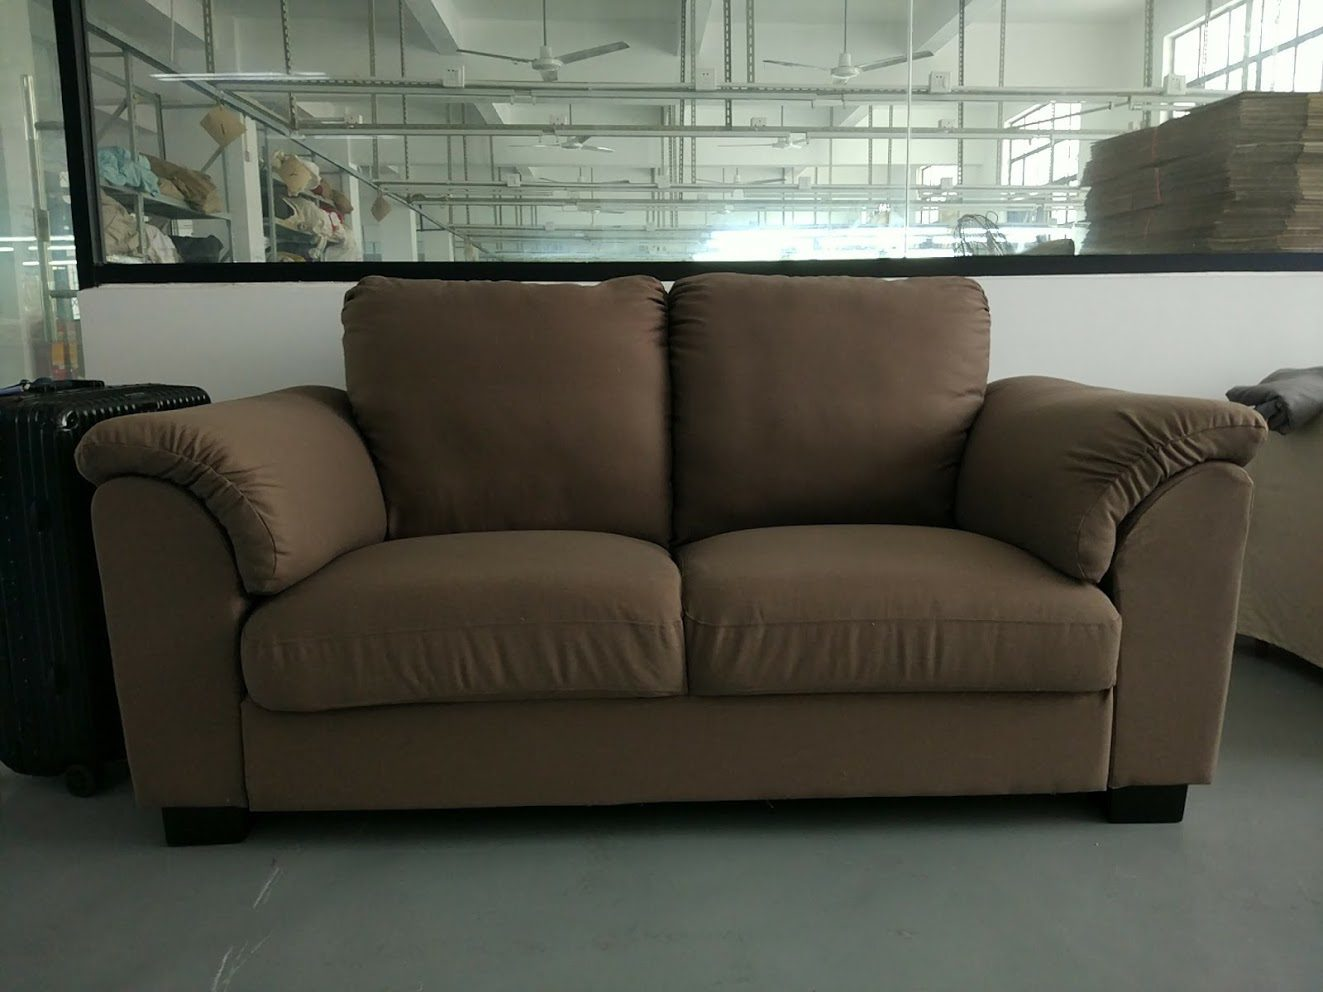 Awe Inspiring Ikea Tidafors Sofa Slipcover Hack Ibusinesslaw Wood Chair Design Ideas Ibusinesslaworg